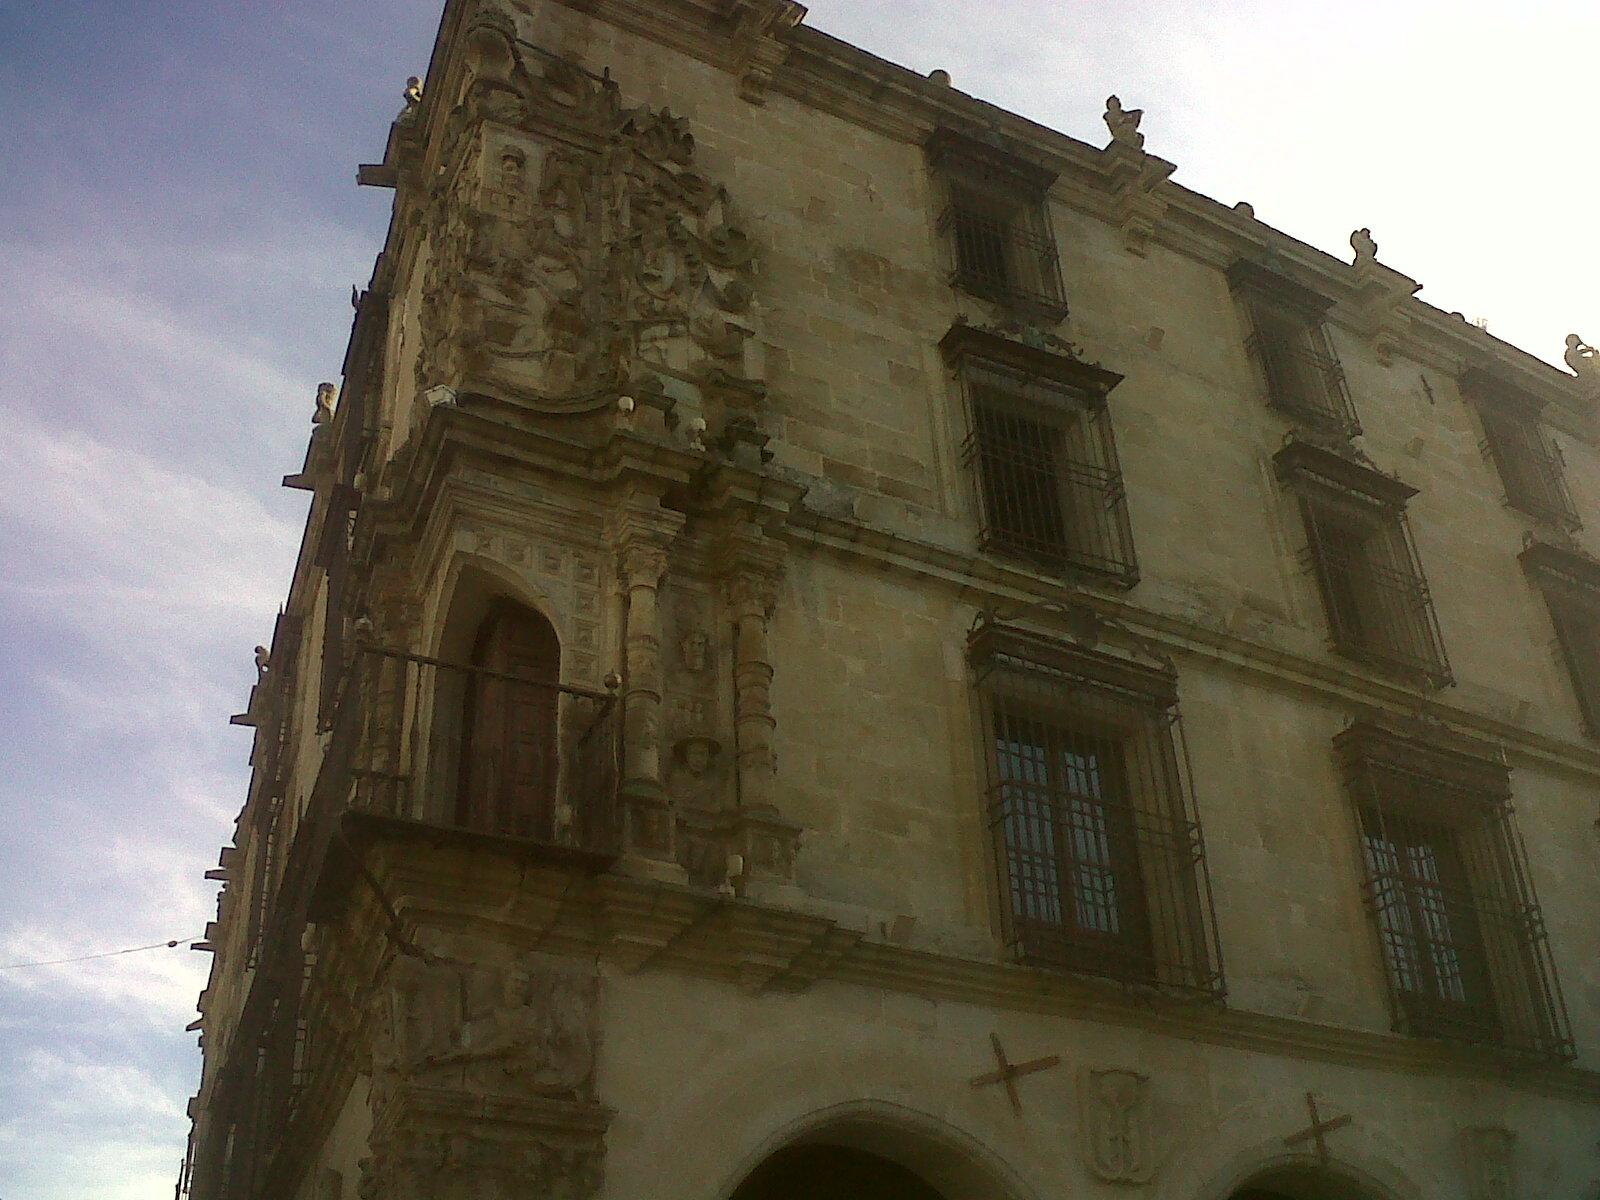 trujillo-palace-of-the conquista pizarro-pl-mayor-sep12